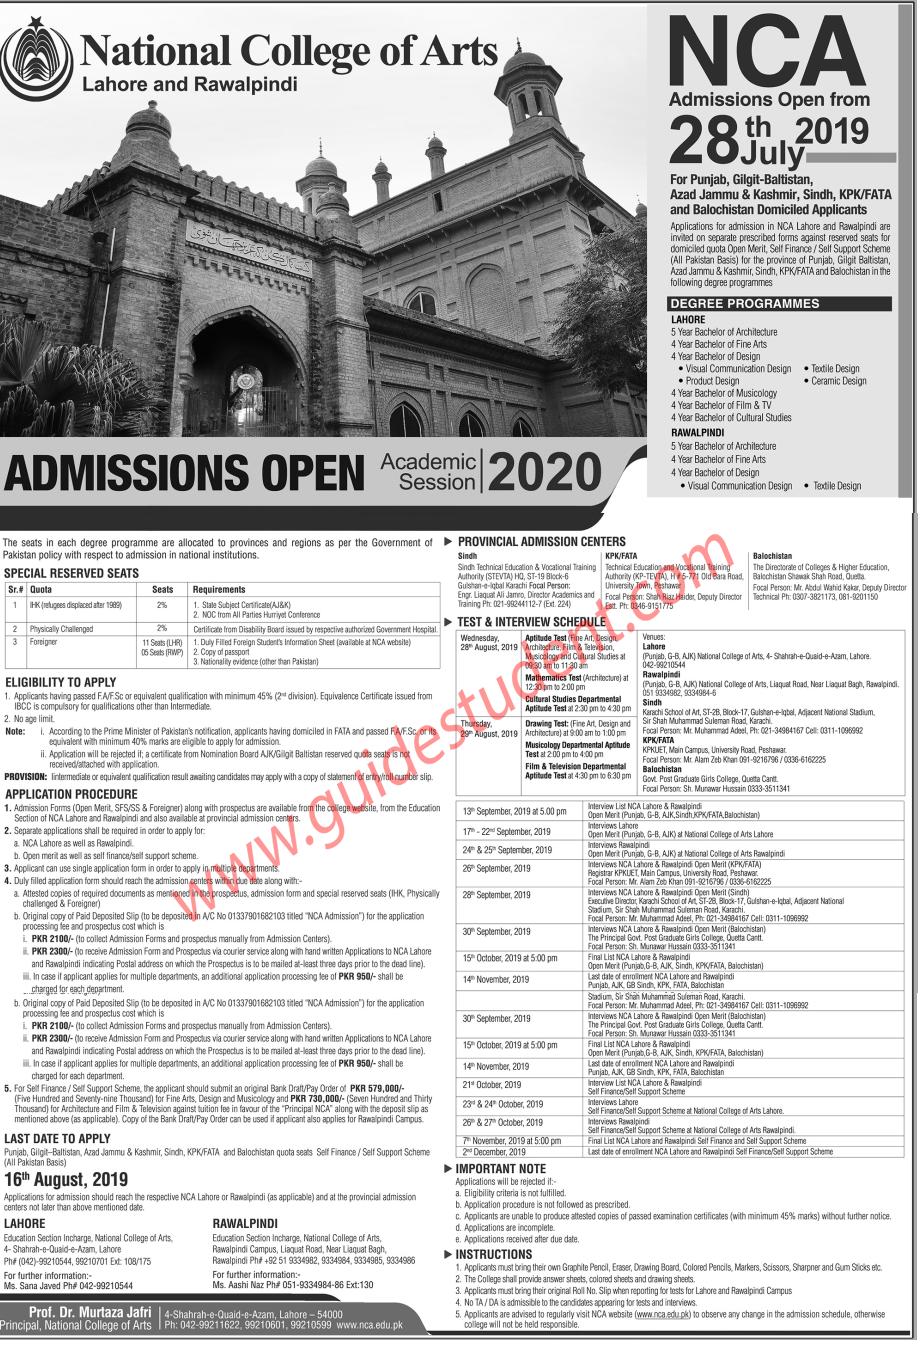 Nca Lahore Rawalpindi Fall Admission 2019 Guidestudent